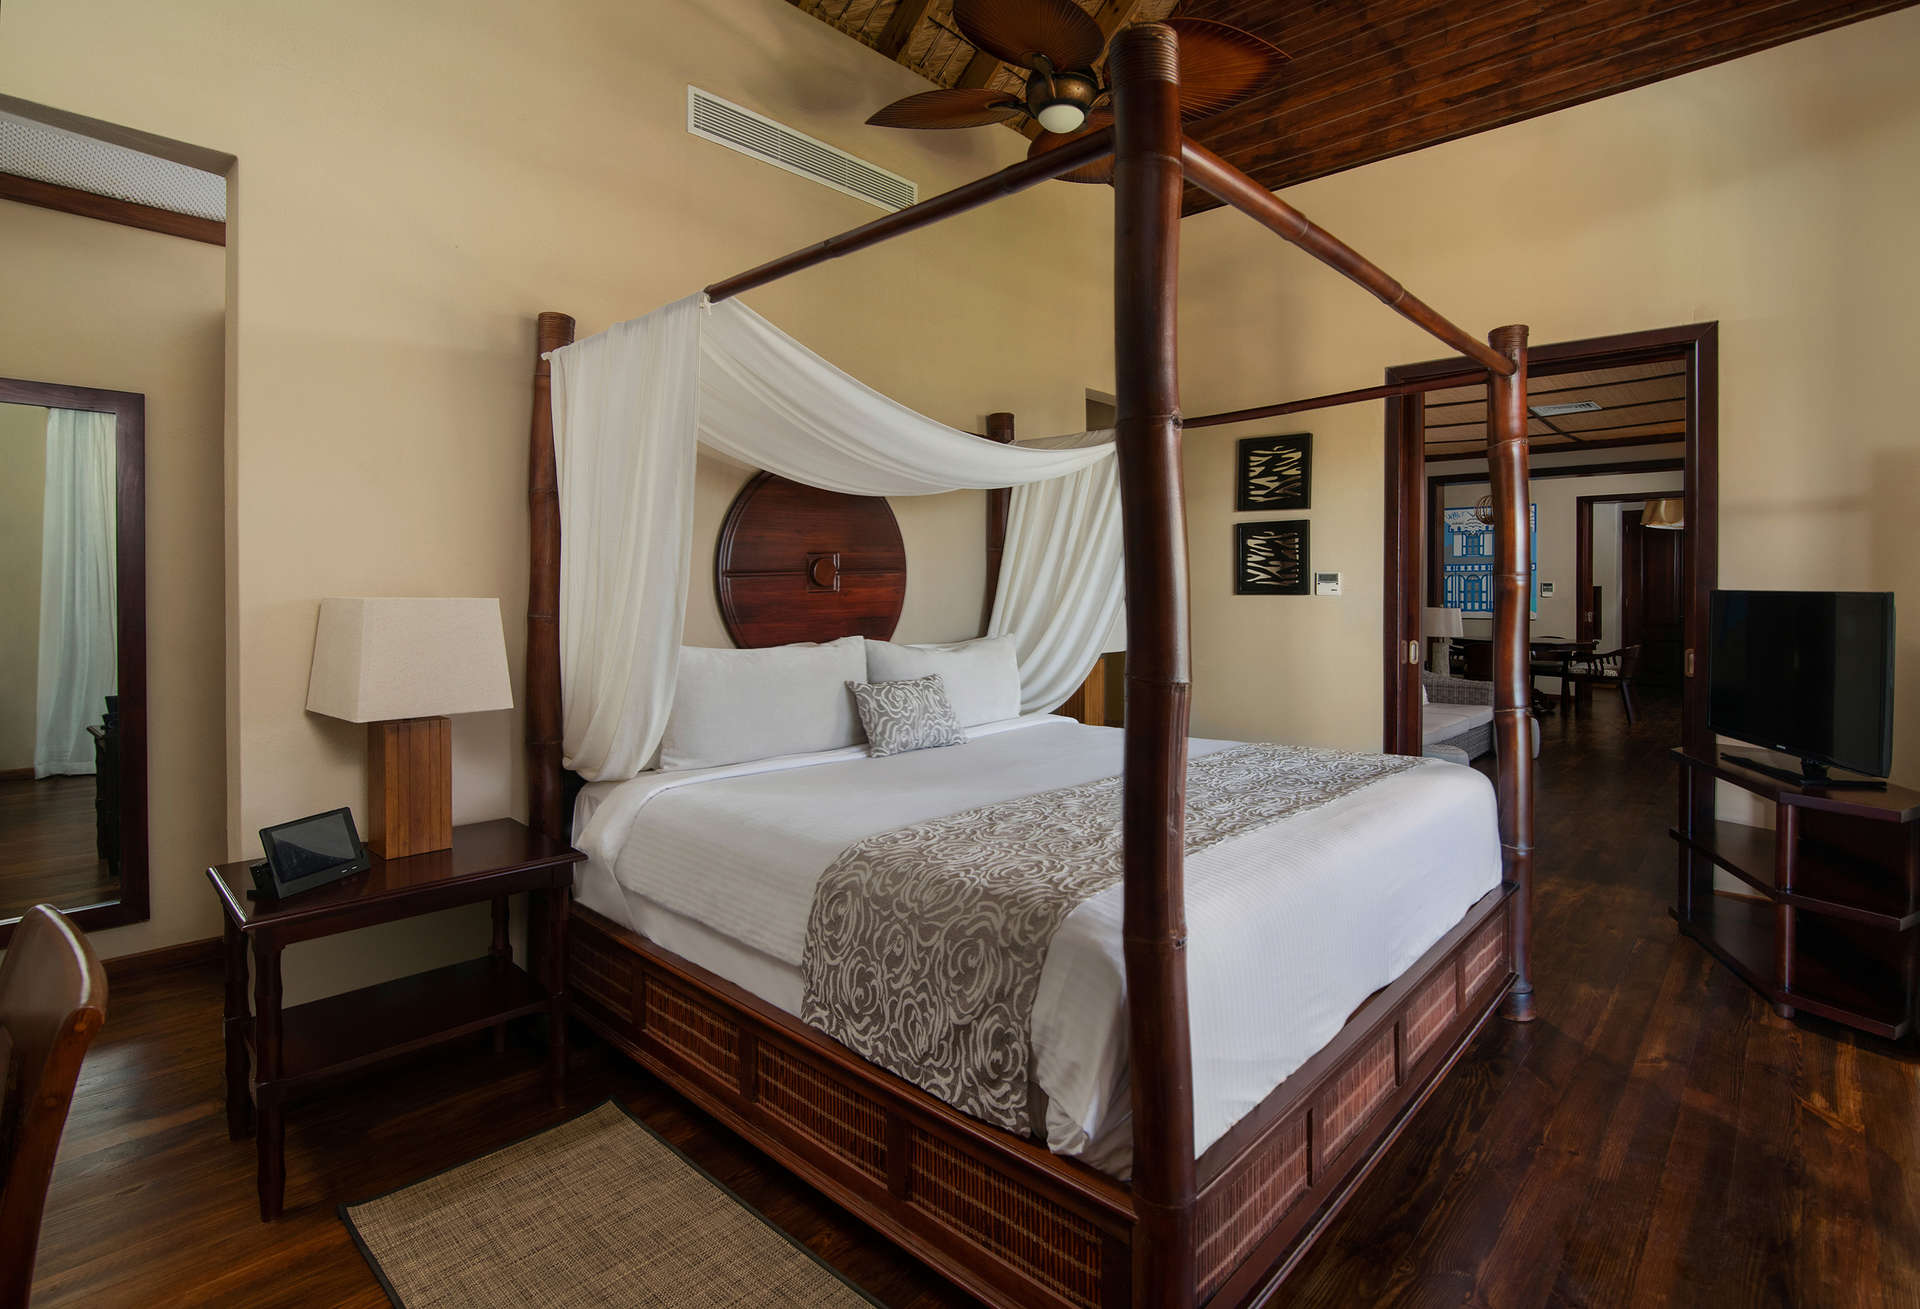 Luxury villa rentals caribbean - Dominican republic - Punta cana - Zoetry agua all inclusive resort - Ocean View Penthouse - Image 1/19